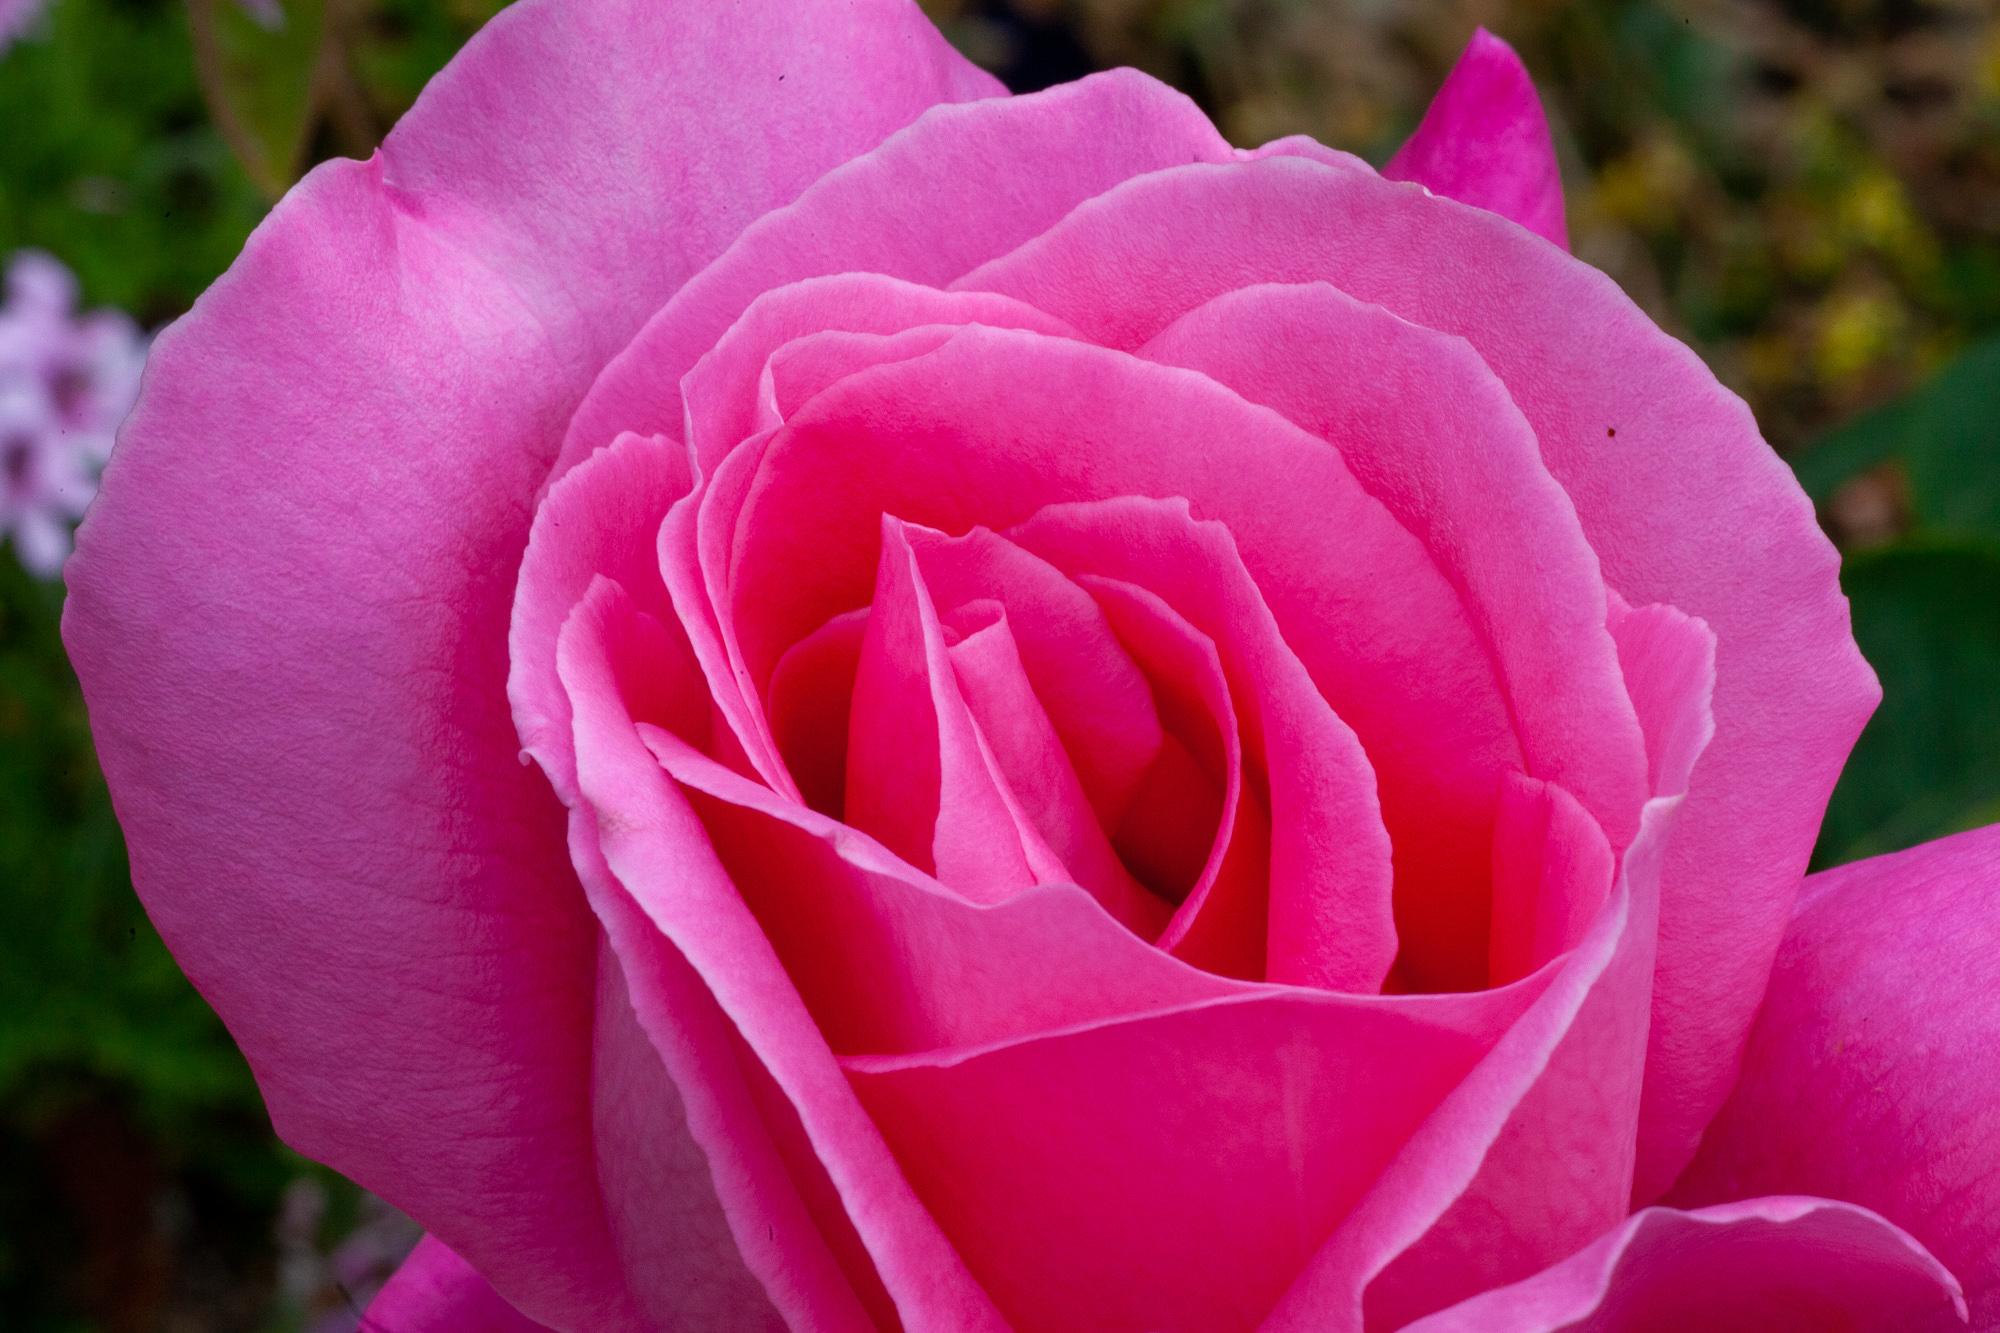 pinkfrostcloseup.jpg